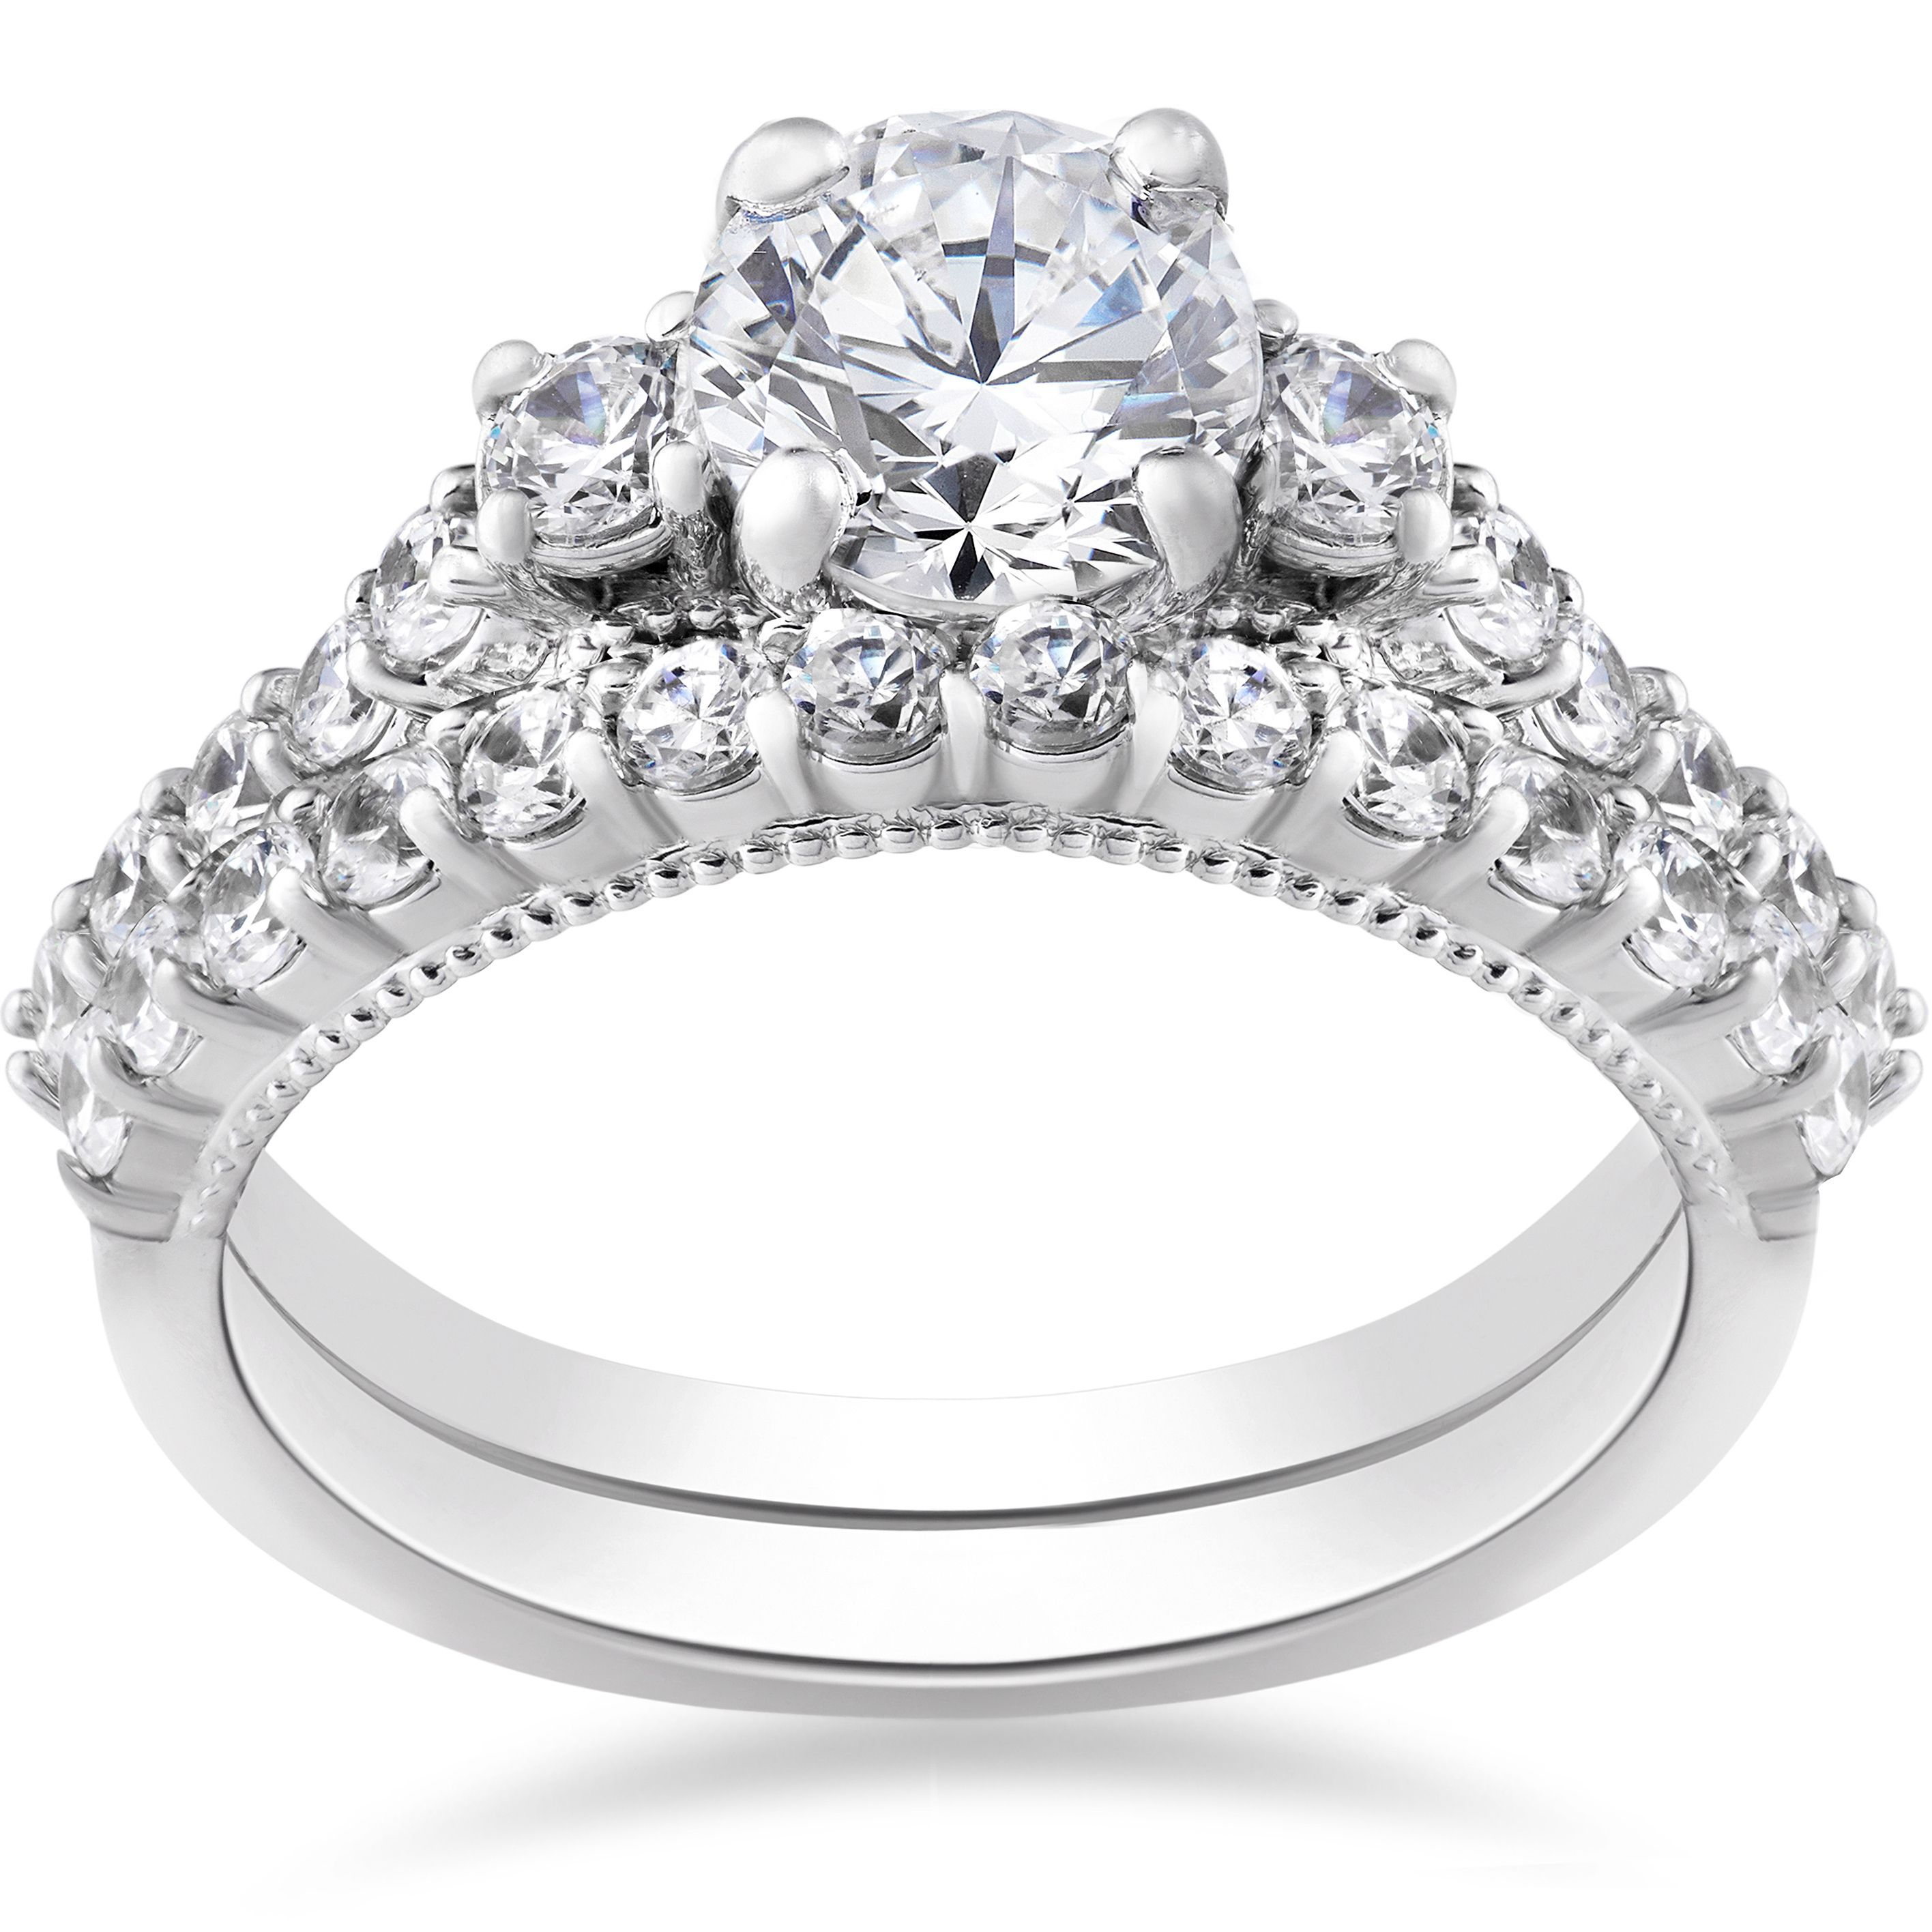 bliss 14k white gold 2 ct tdw diamond clarity enhanced vintage